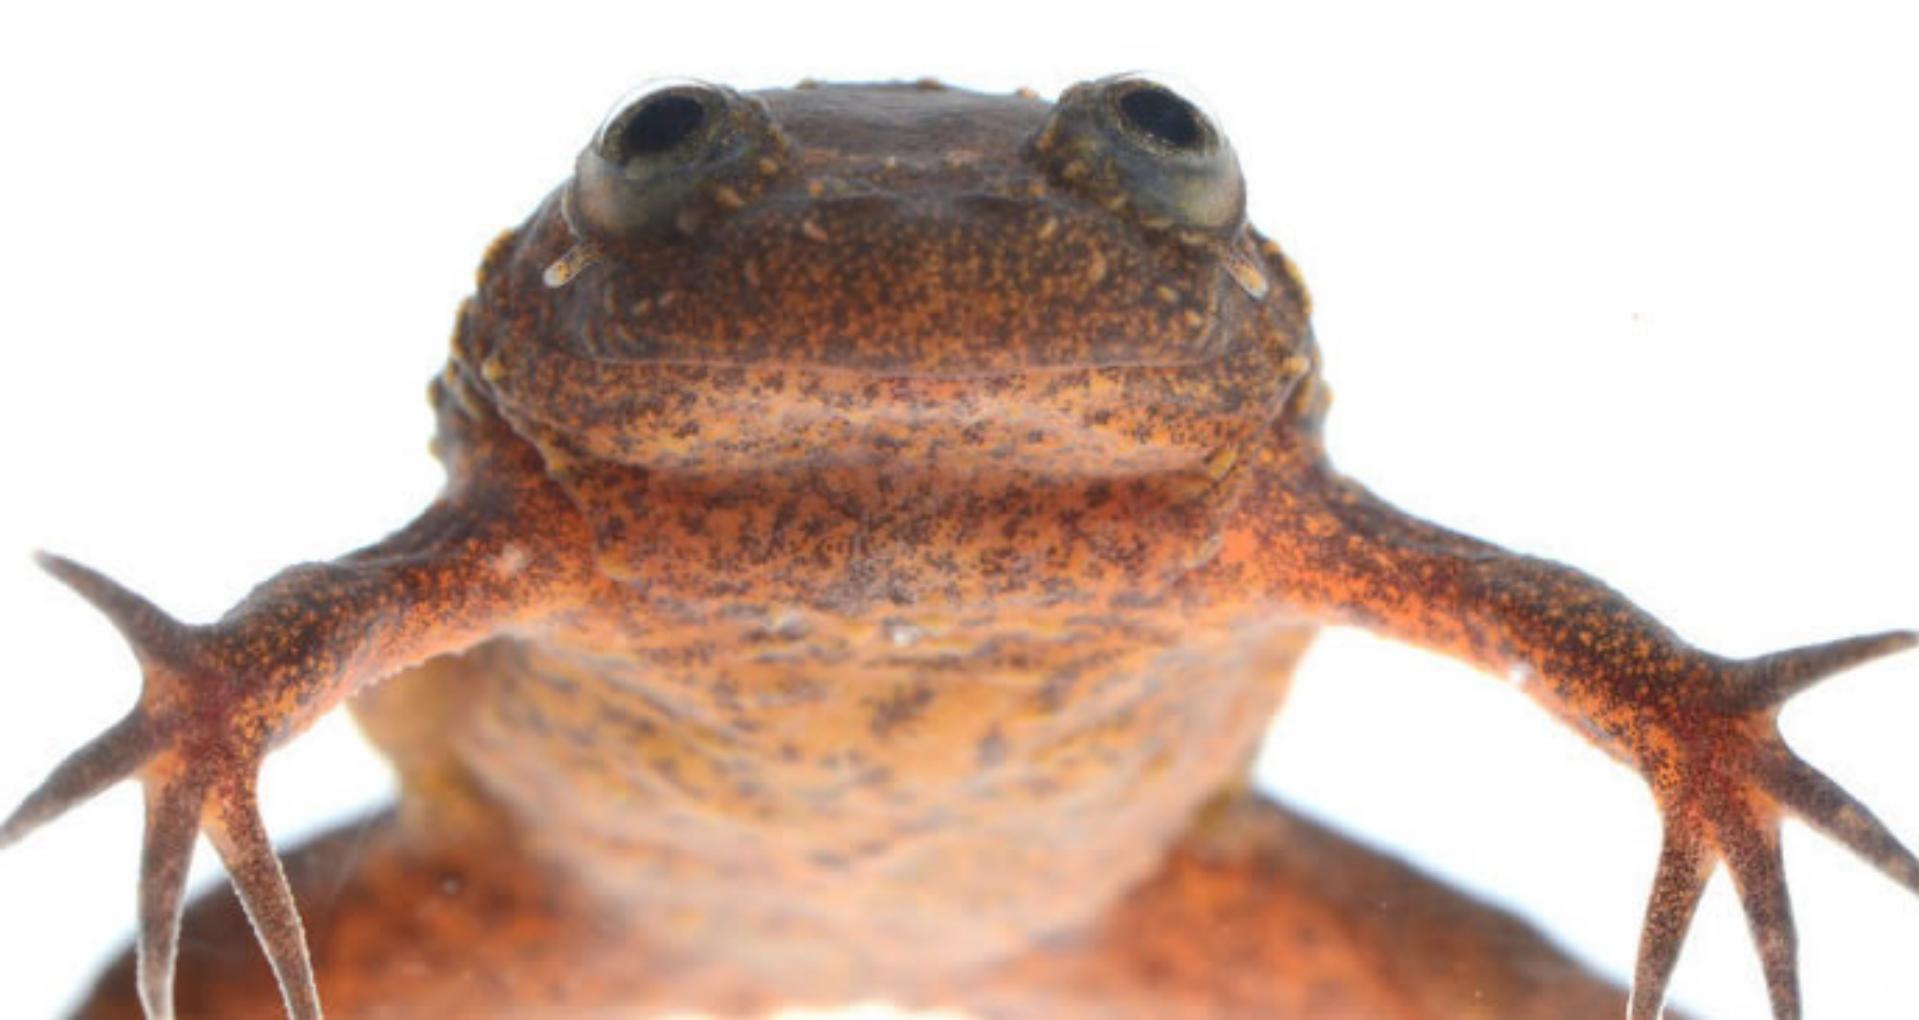 Cameroon Amphibian Survey